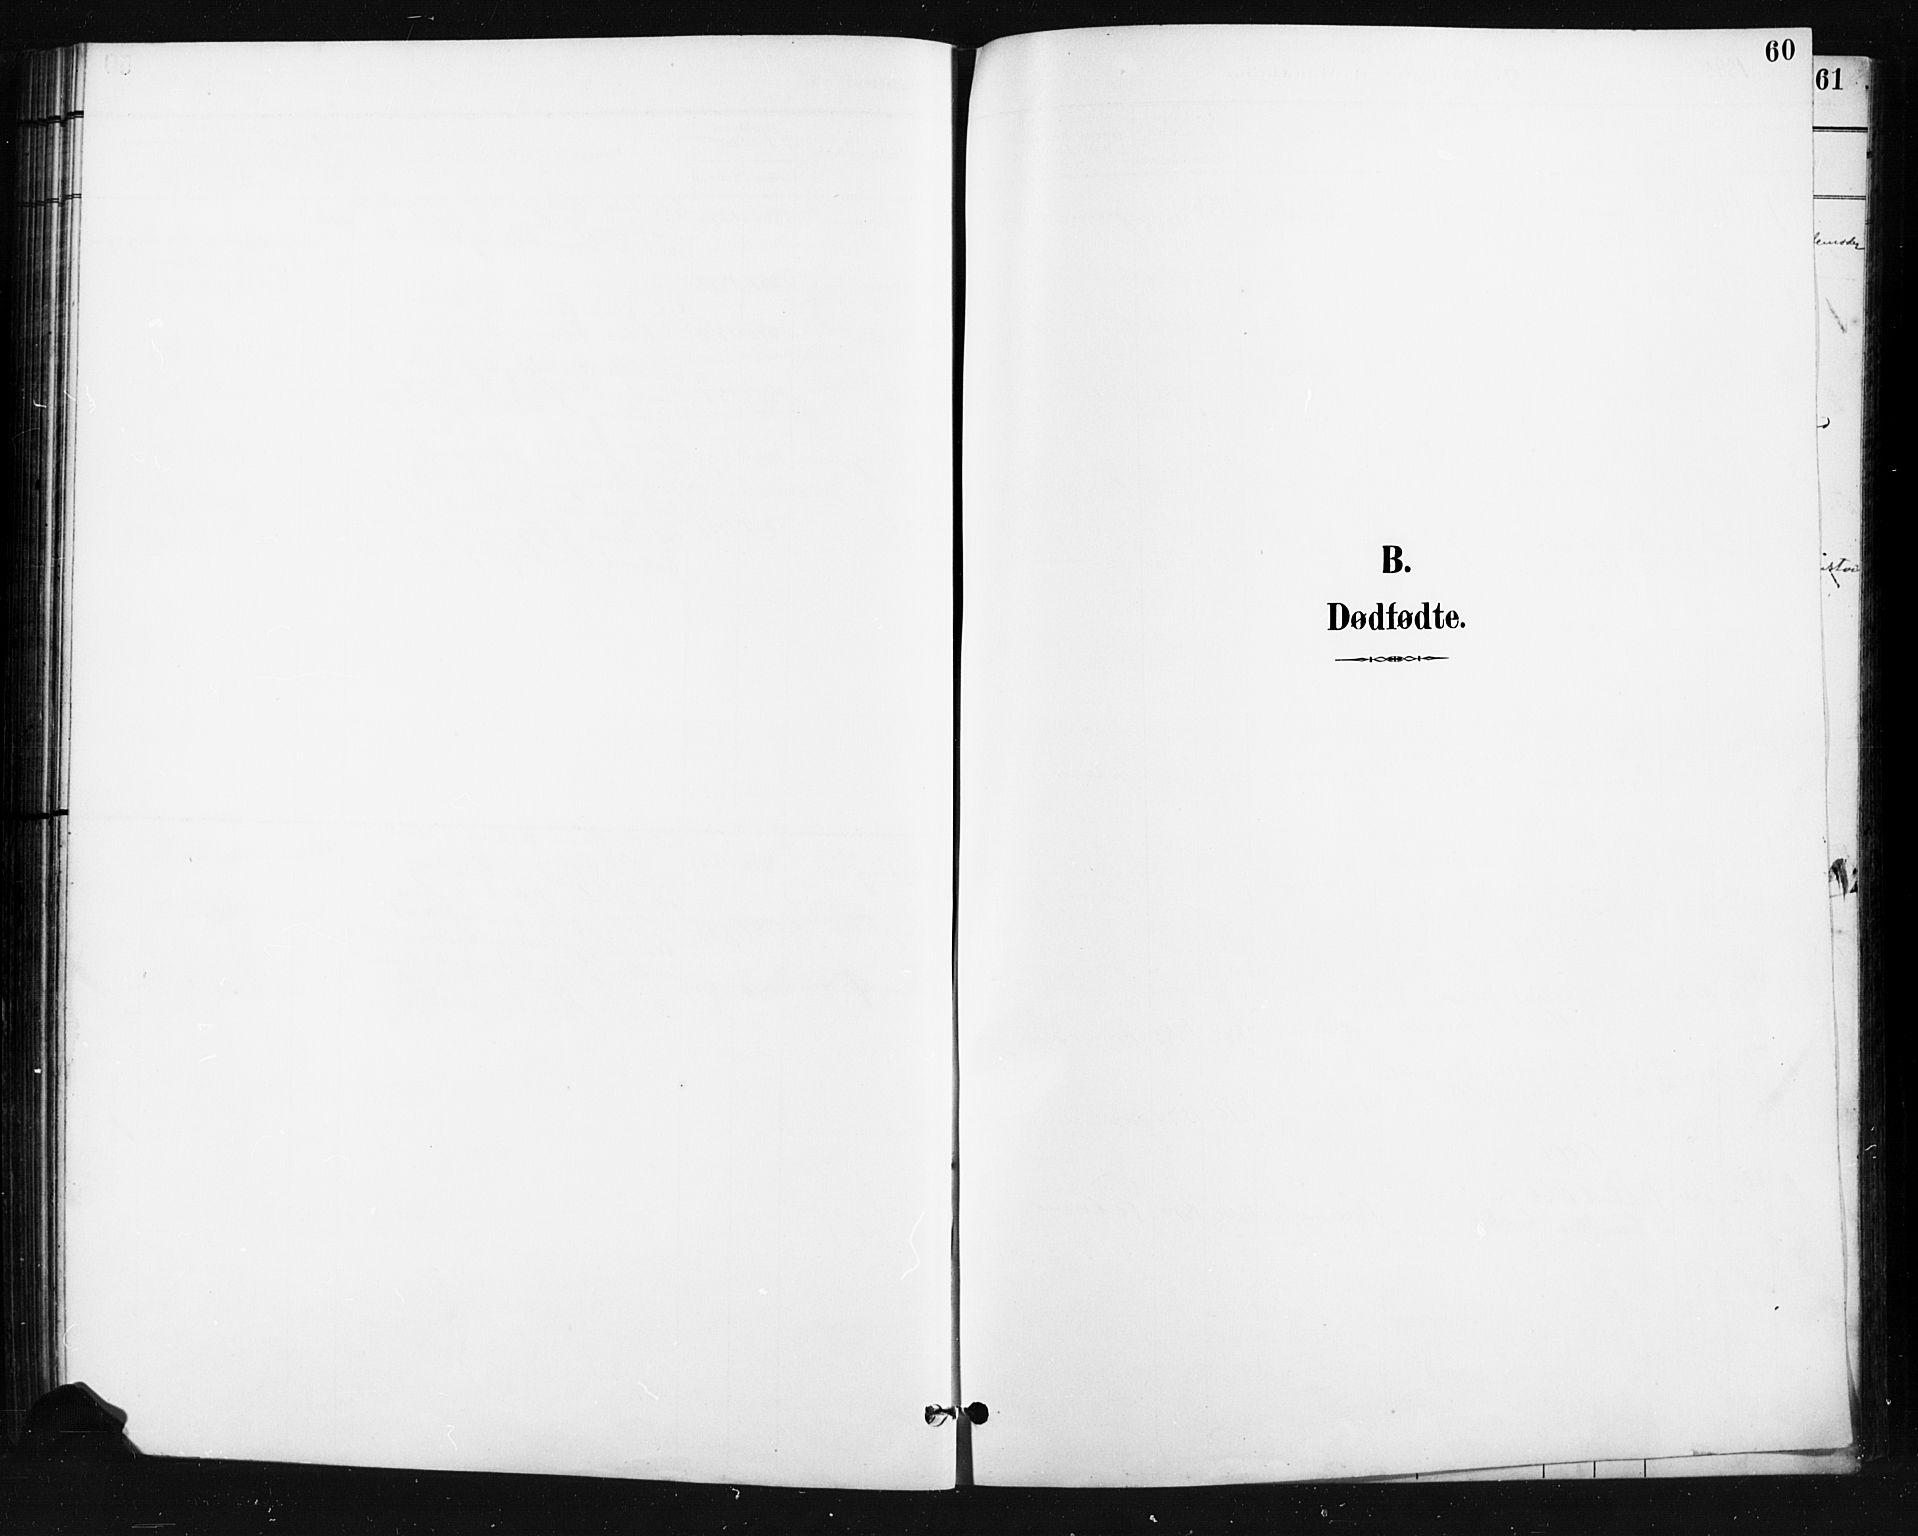 SAH, Skjåk prestekontor, Klokkerbok nr. 4, 1895-1921, s. 60